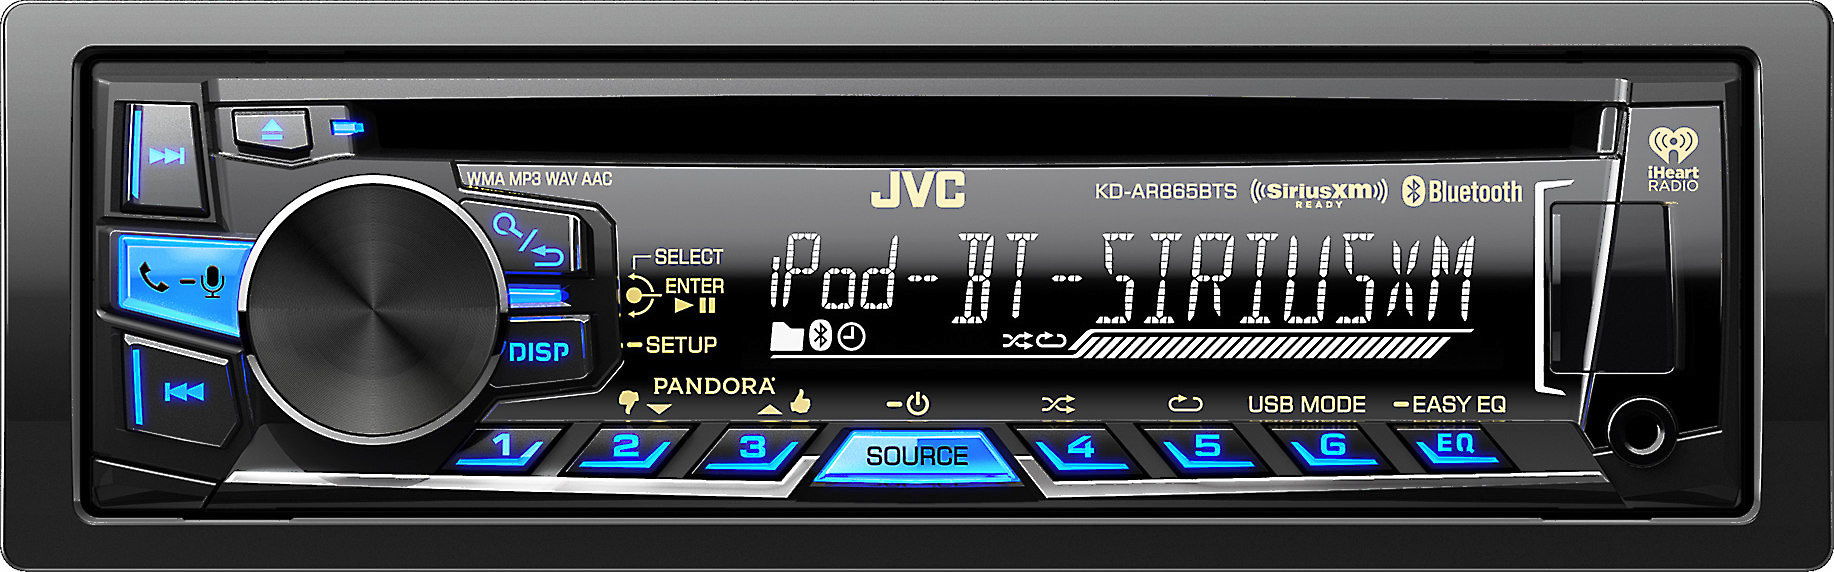 JVC KD-AR865BTS RECEIVER BLUETOOTH WINDOWS 10 DOWNLOAD DRIVER